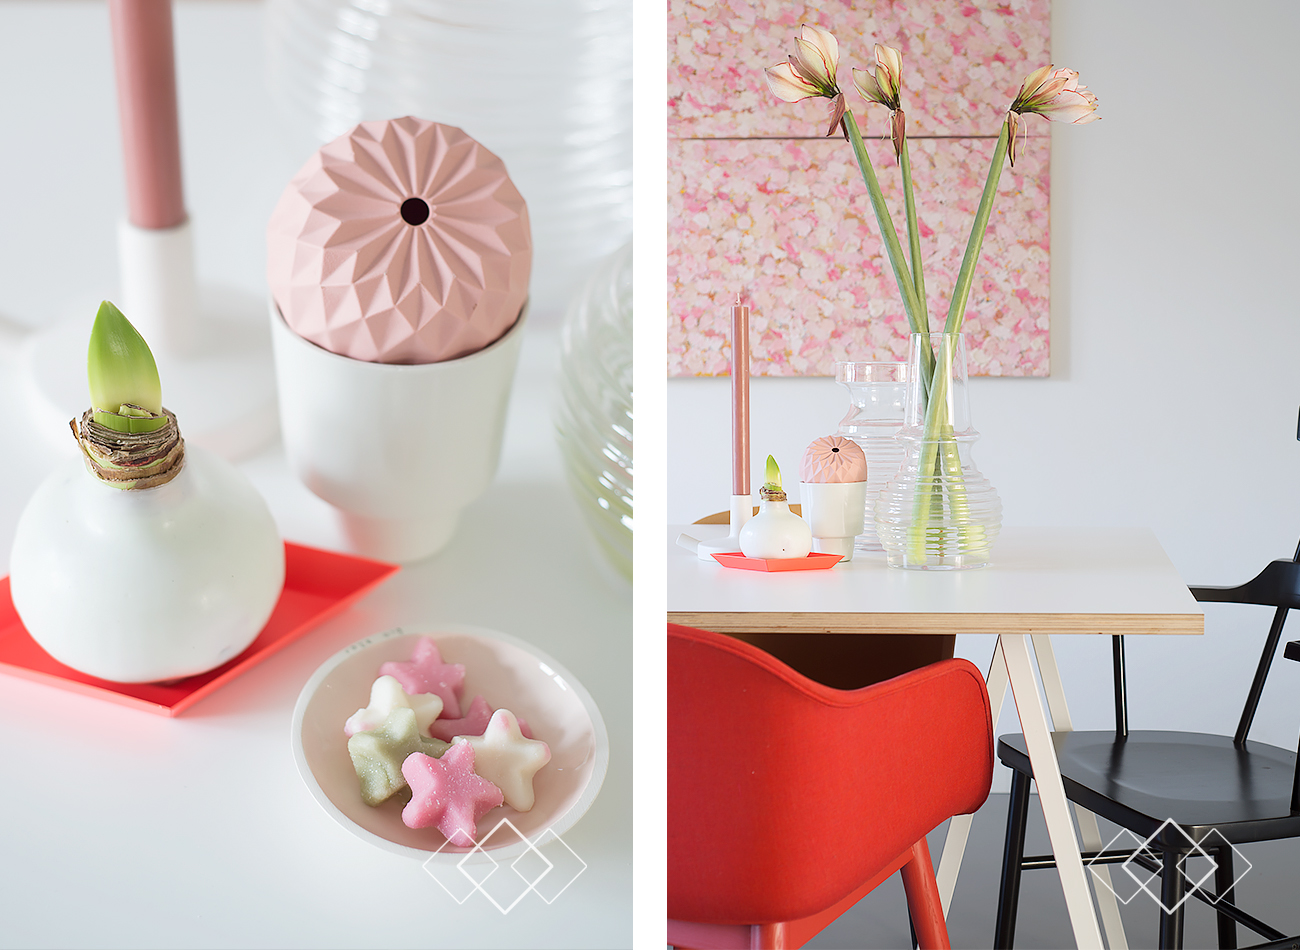 Decoratie Woonkamer Rood : Woonkamer decoratie rood roze decoratie woonkamer la beauté et